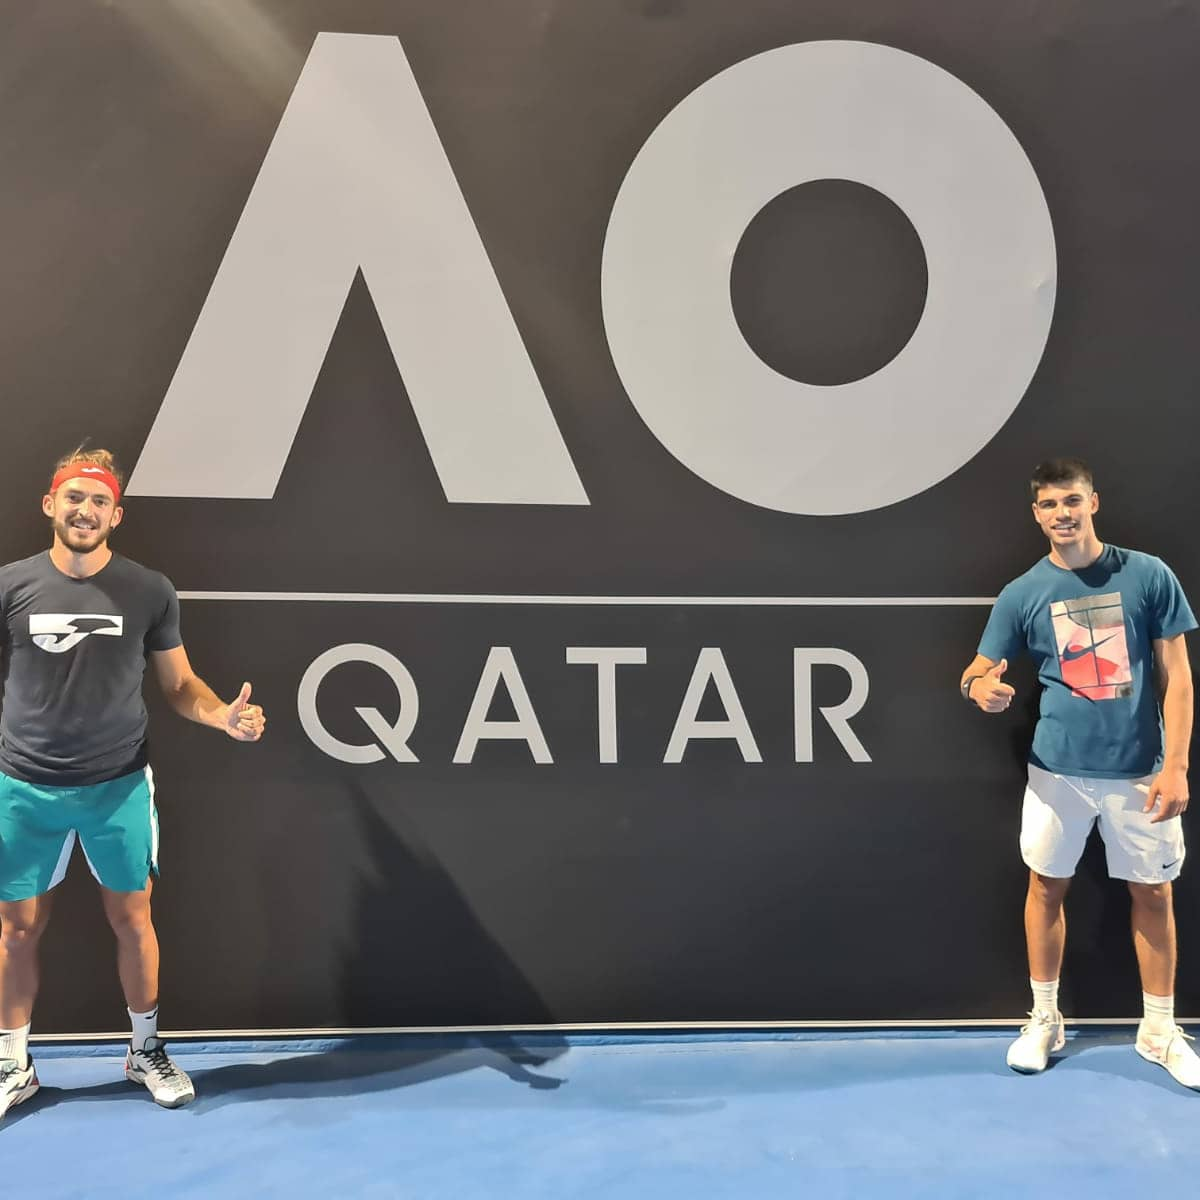 Ya estamos en Doha preparados para disputar la qualy de AO, primer entreno hoy con Mario Vilella# seguimos We are already in Doha ready to play the AO qualification, first practice today with Mario Vilella https://t.co/NYkpgPNitf